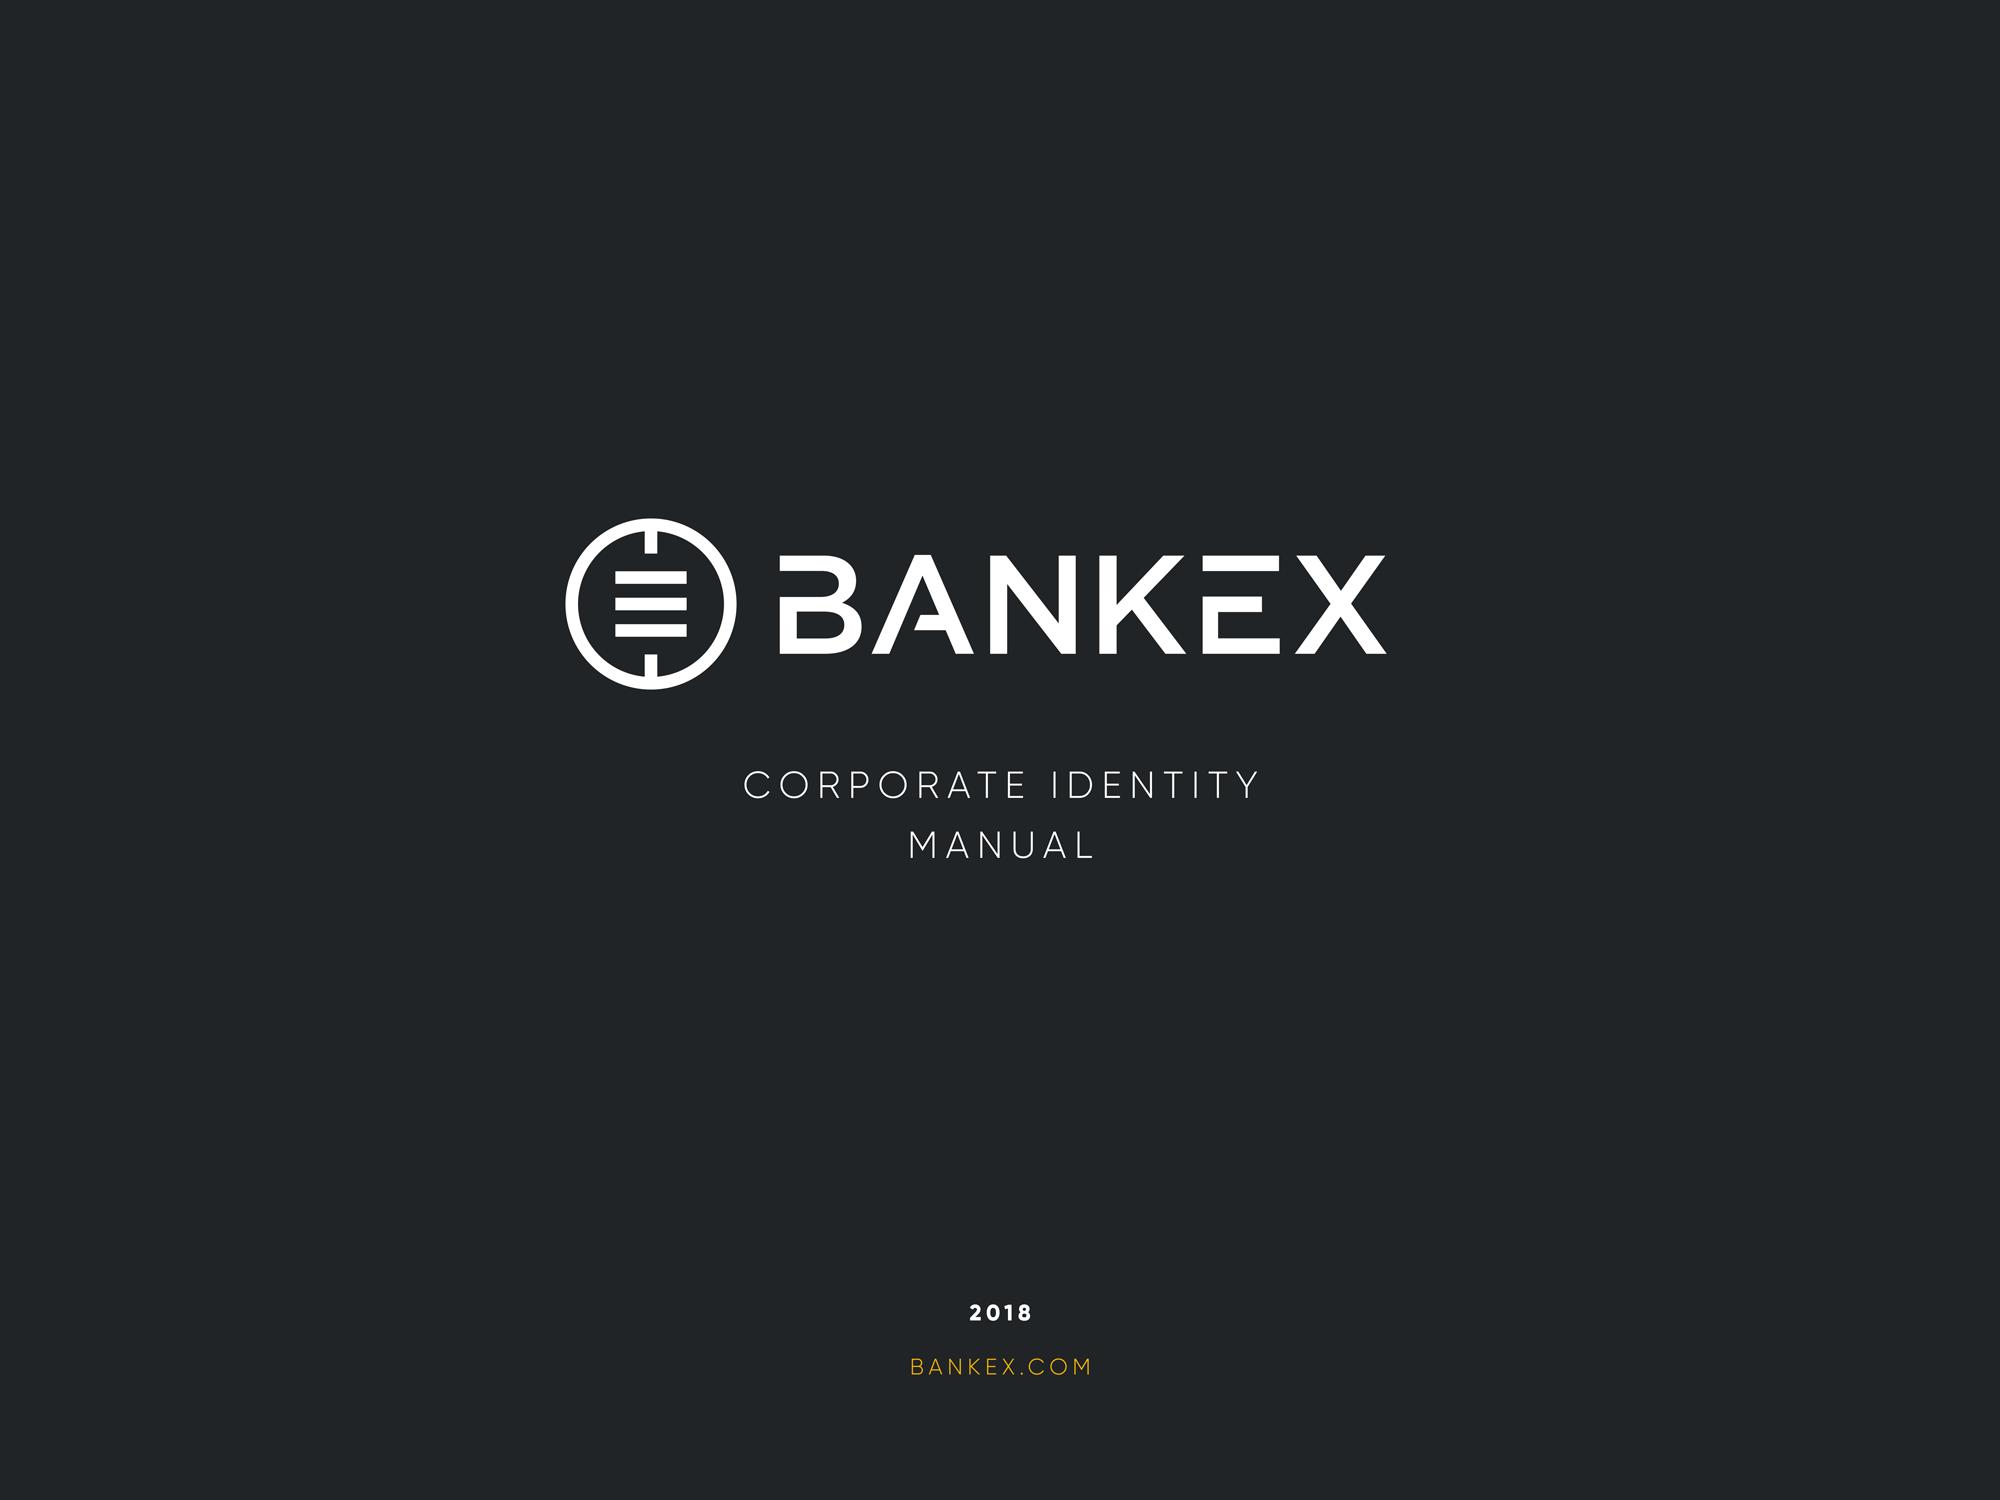 bankex_brandook_web-1.png